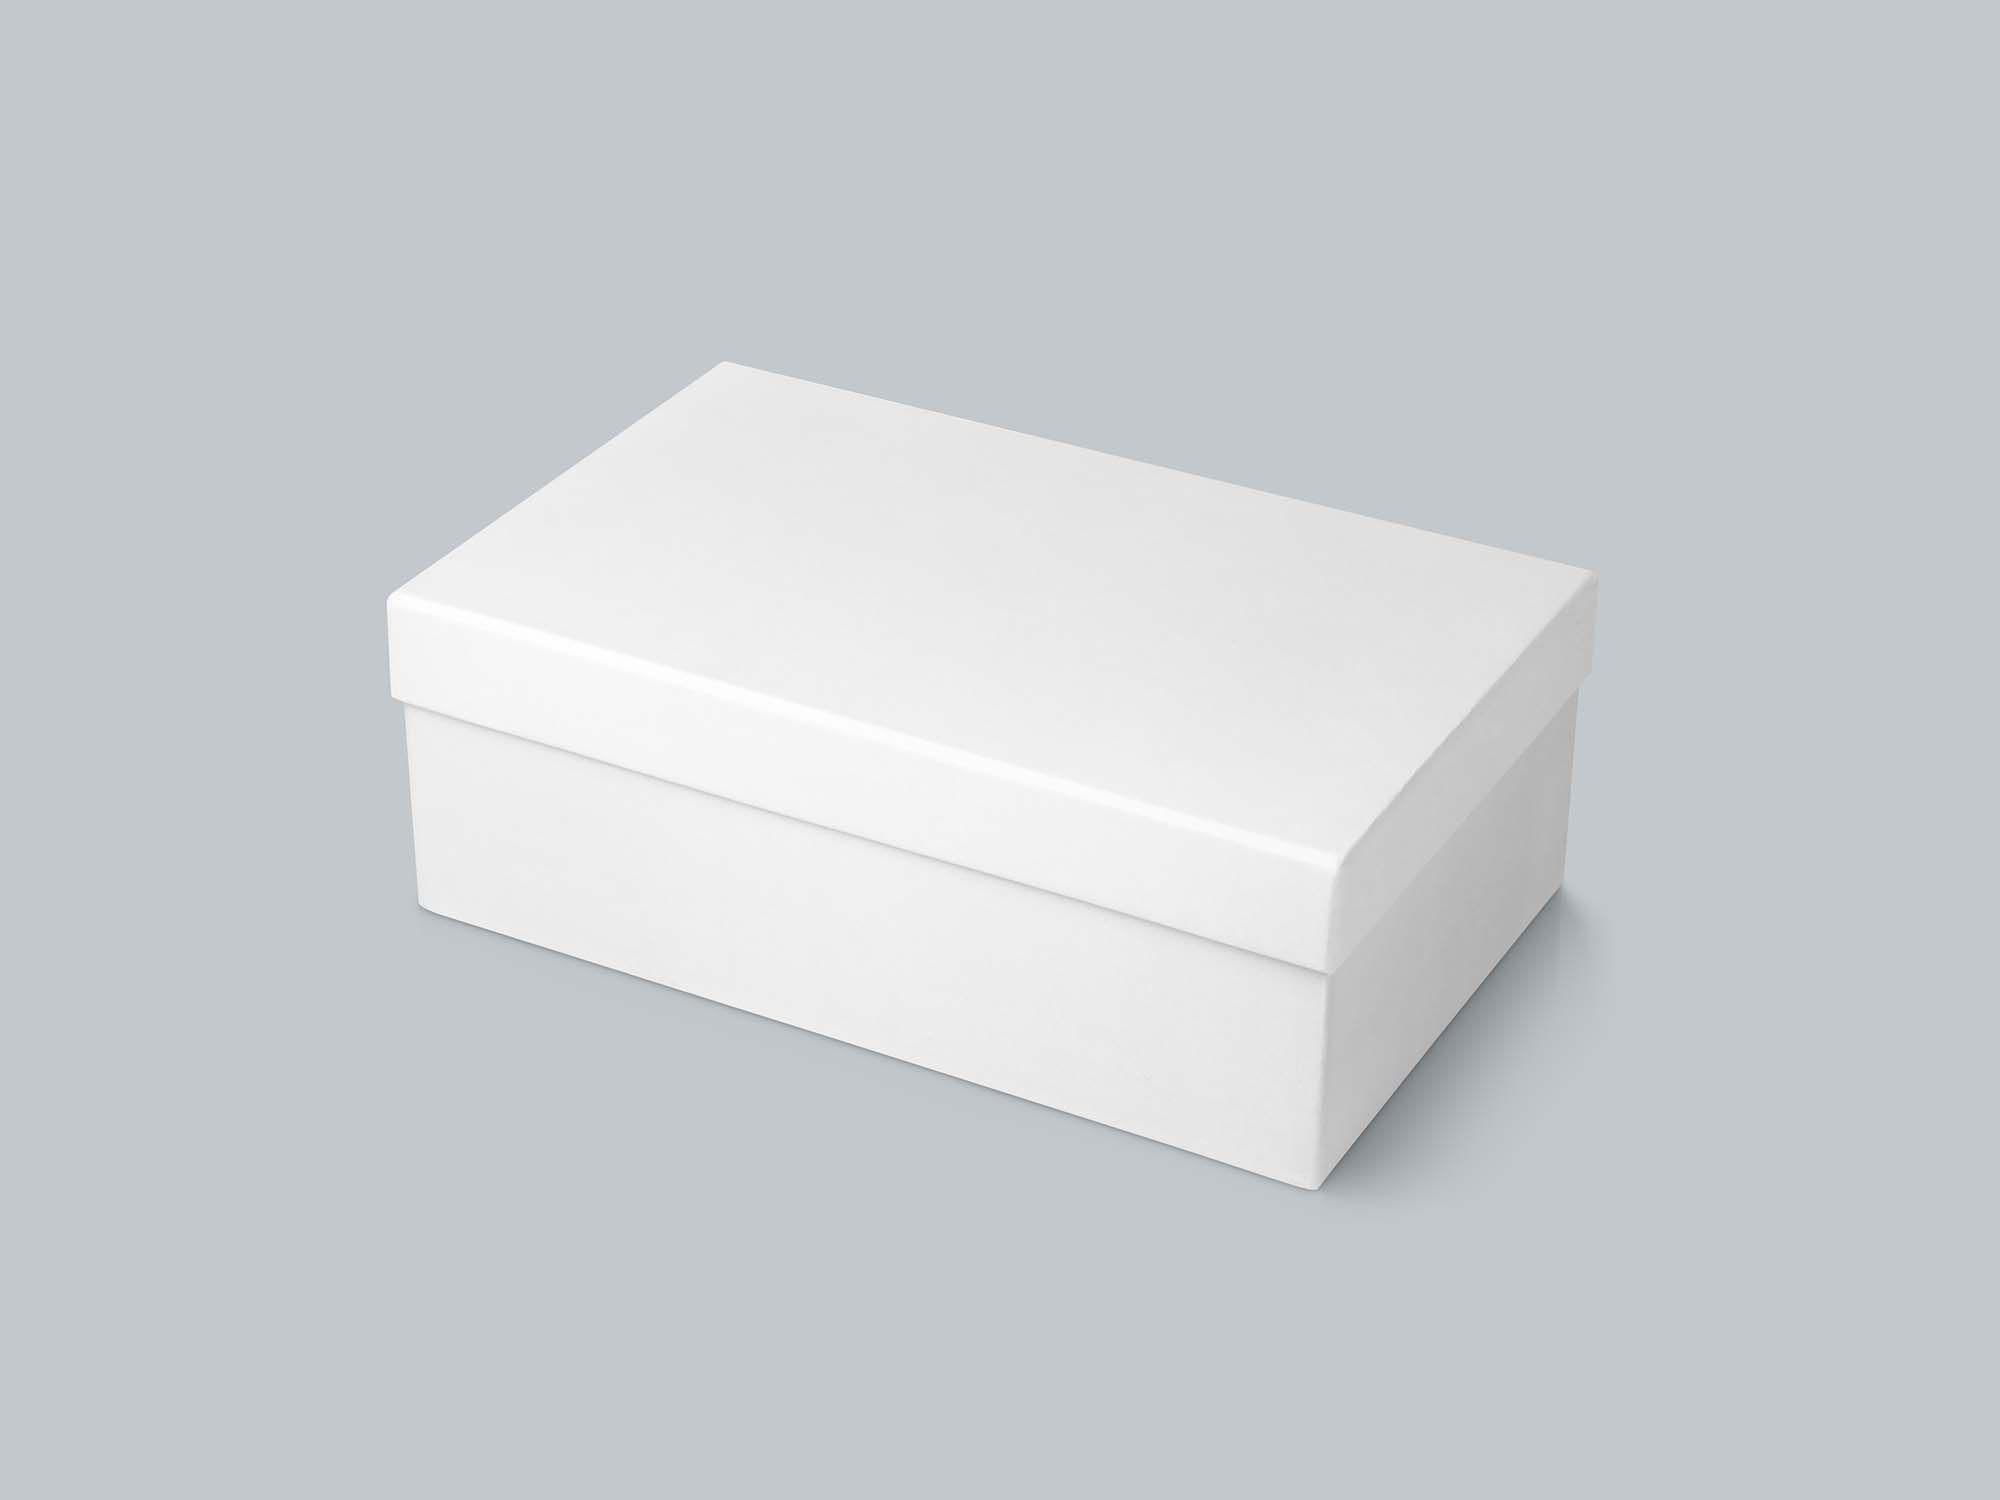 Download Shoe Box Packaging Mockup Shoe Box Design Shoe Box Packaging Mockup